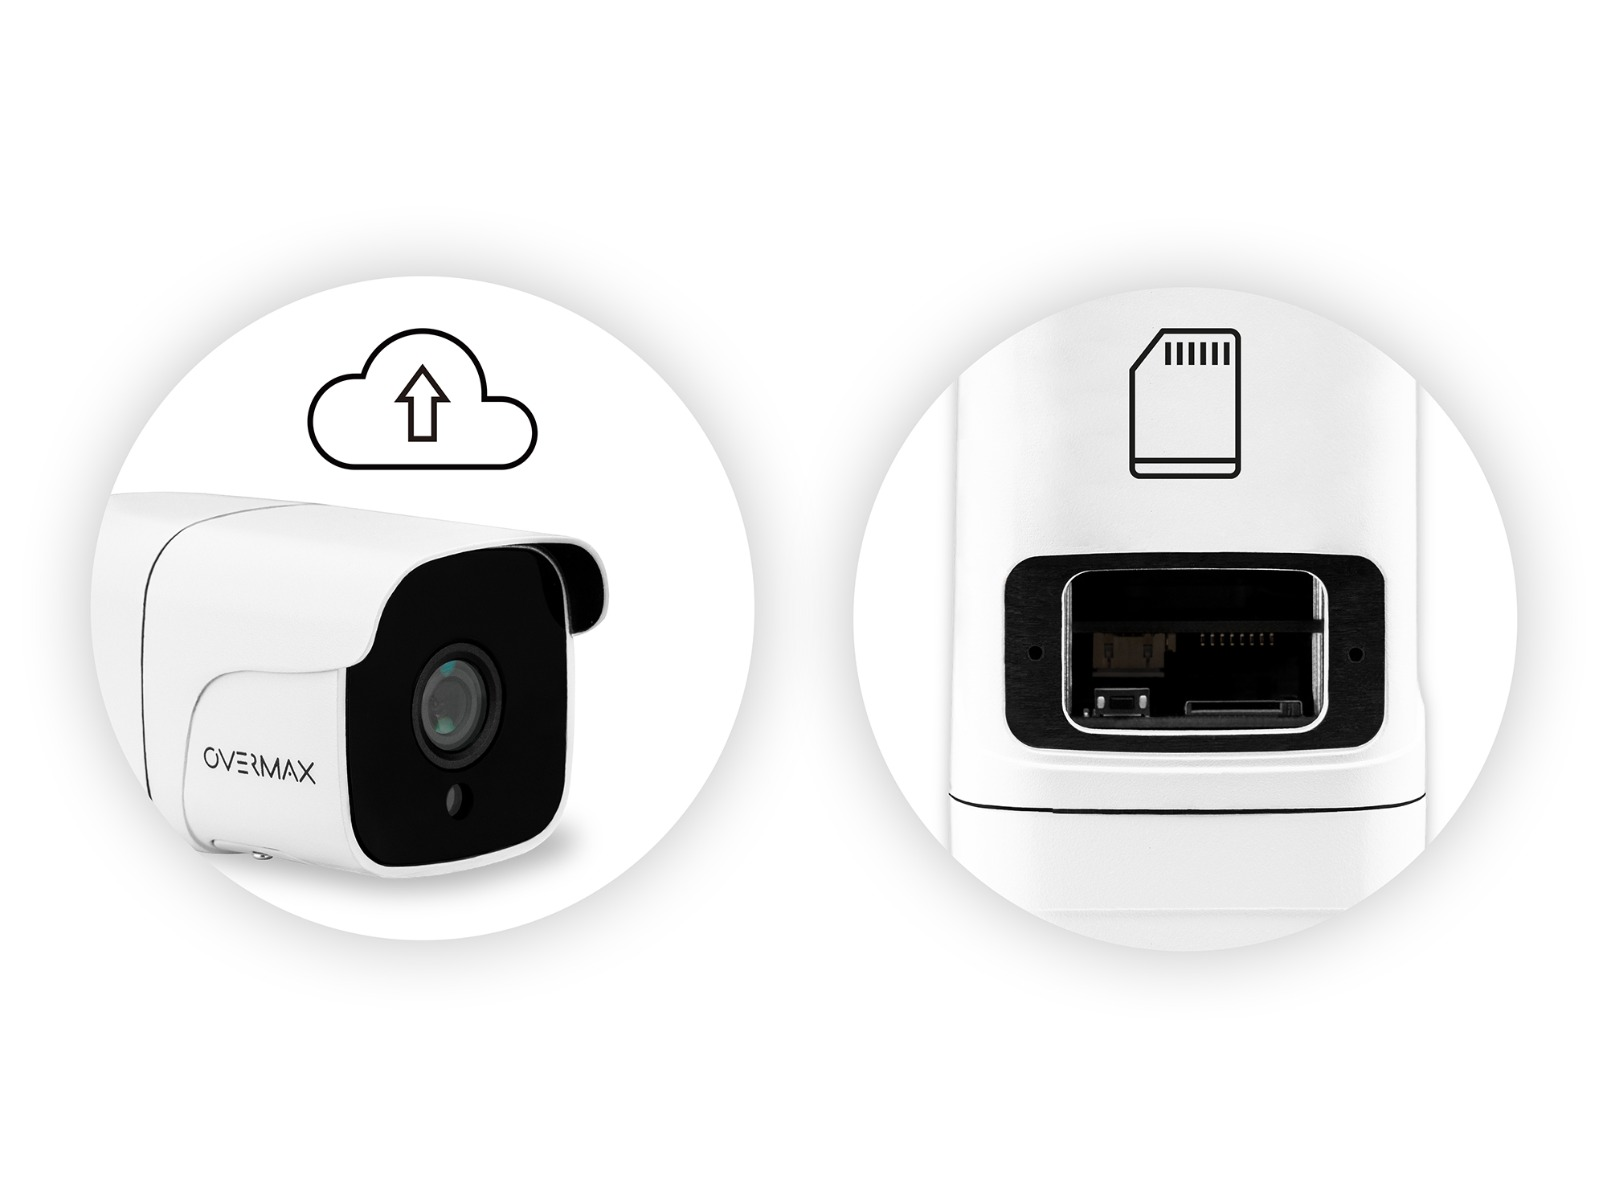 Zewnętrzna kamera IP Overmax Camspot 4.7 One